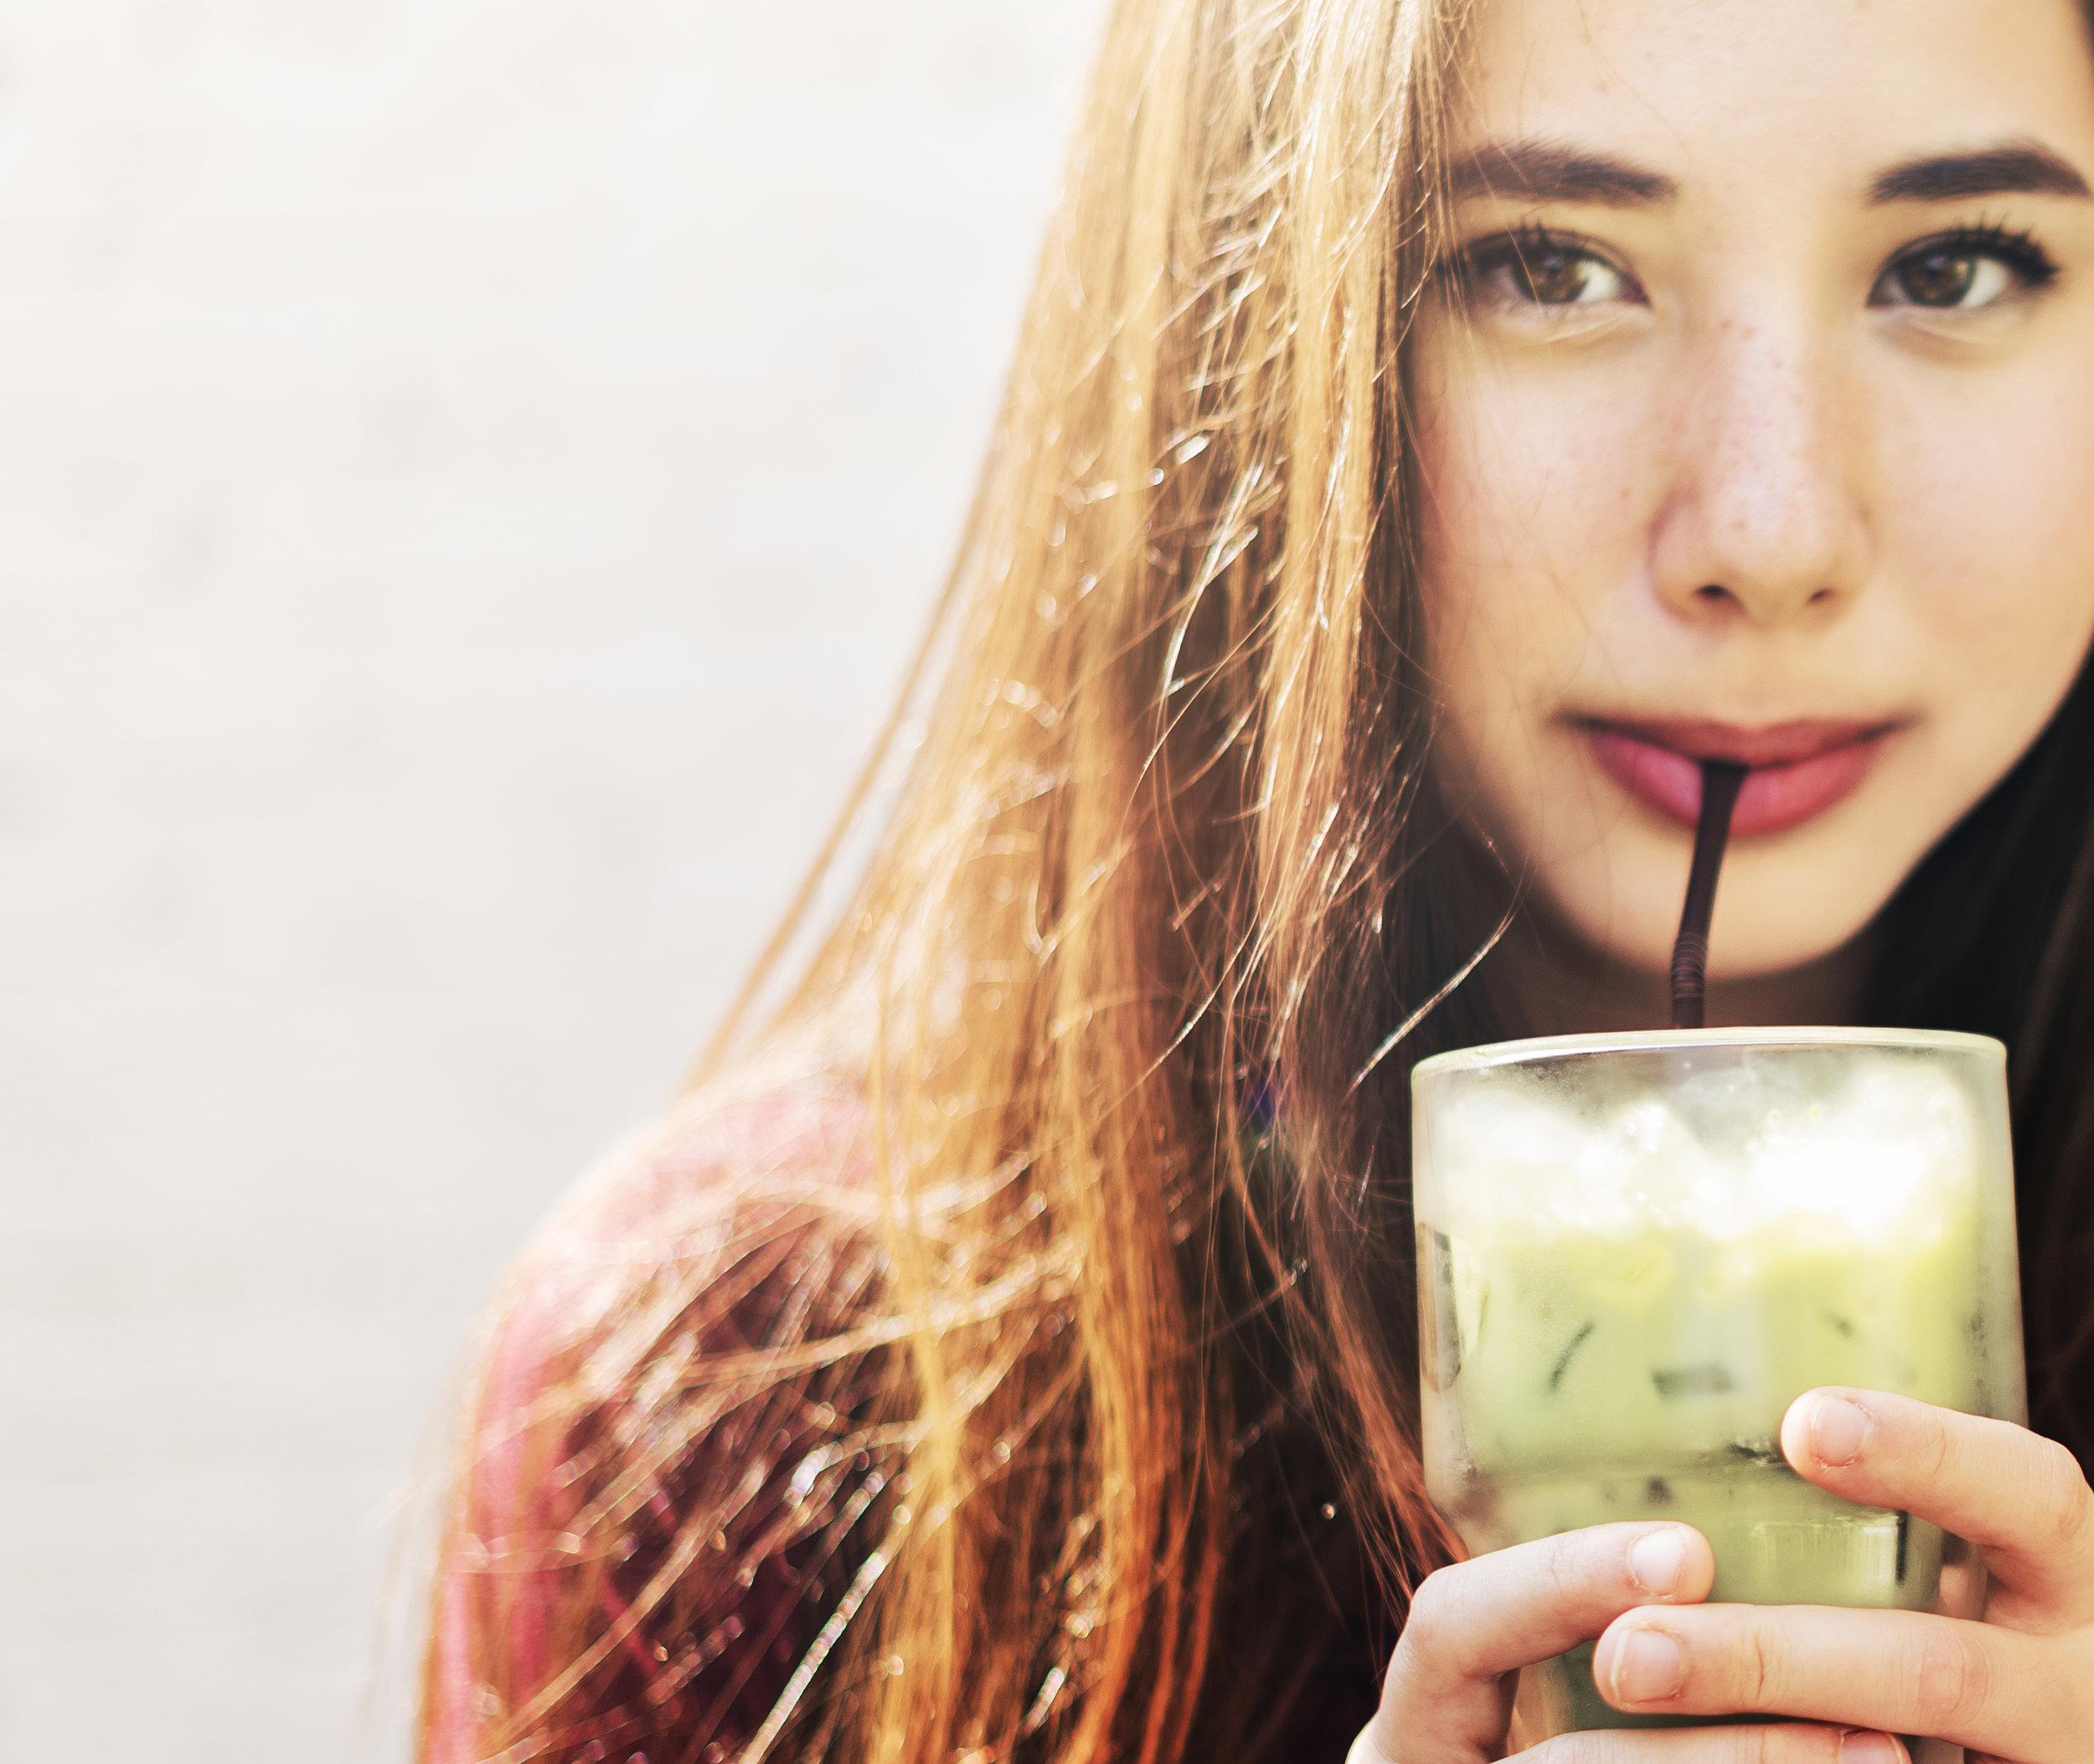 woman-refreshing-herself-with-green-tea-PB92654.jpg